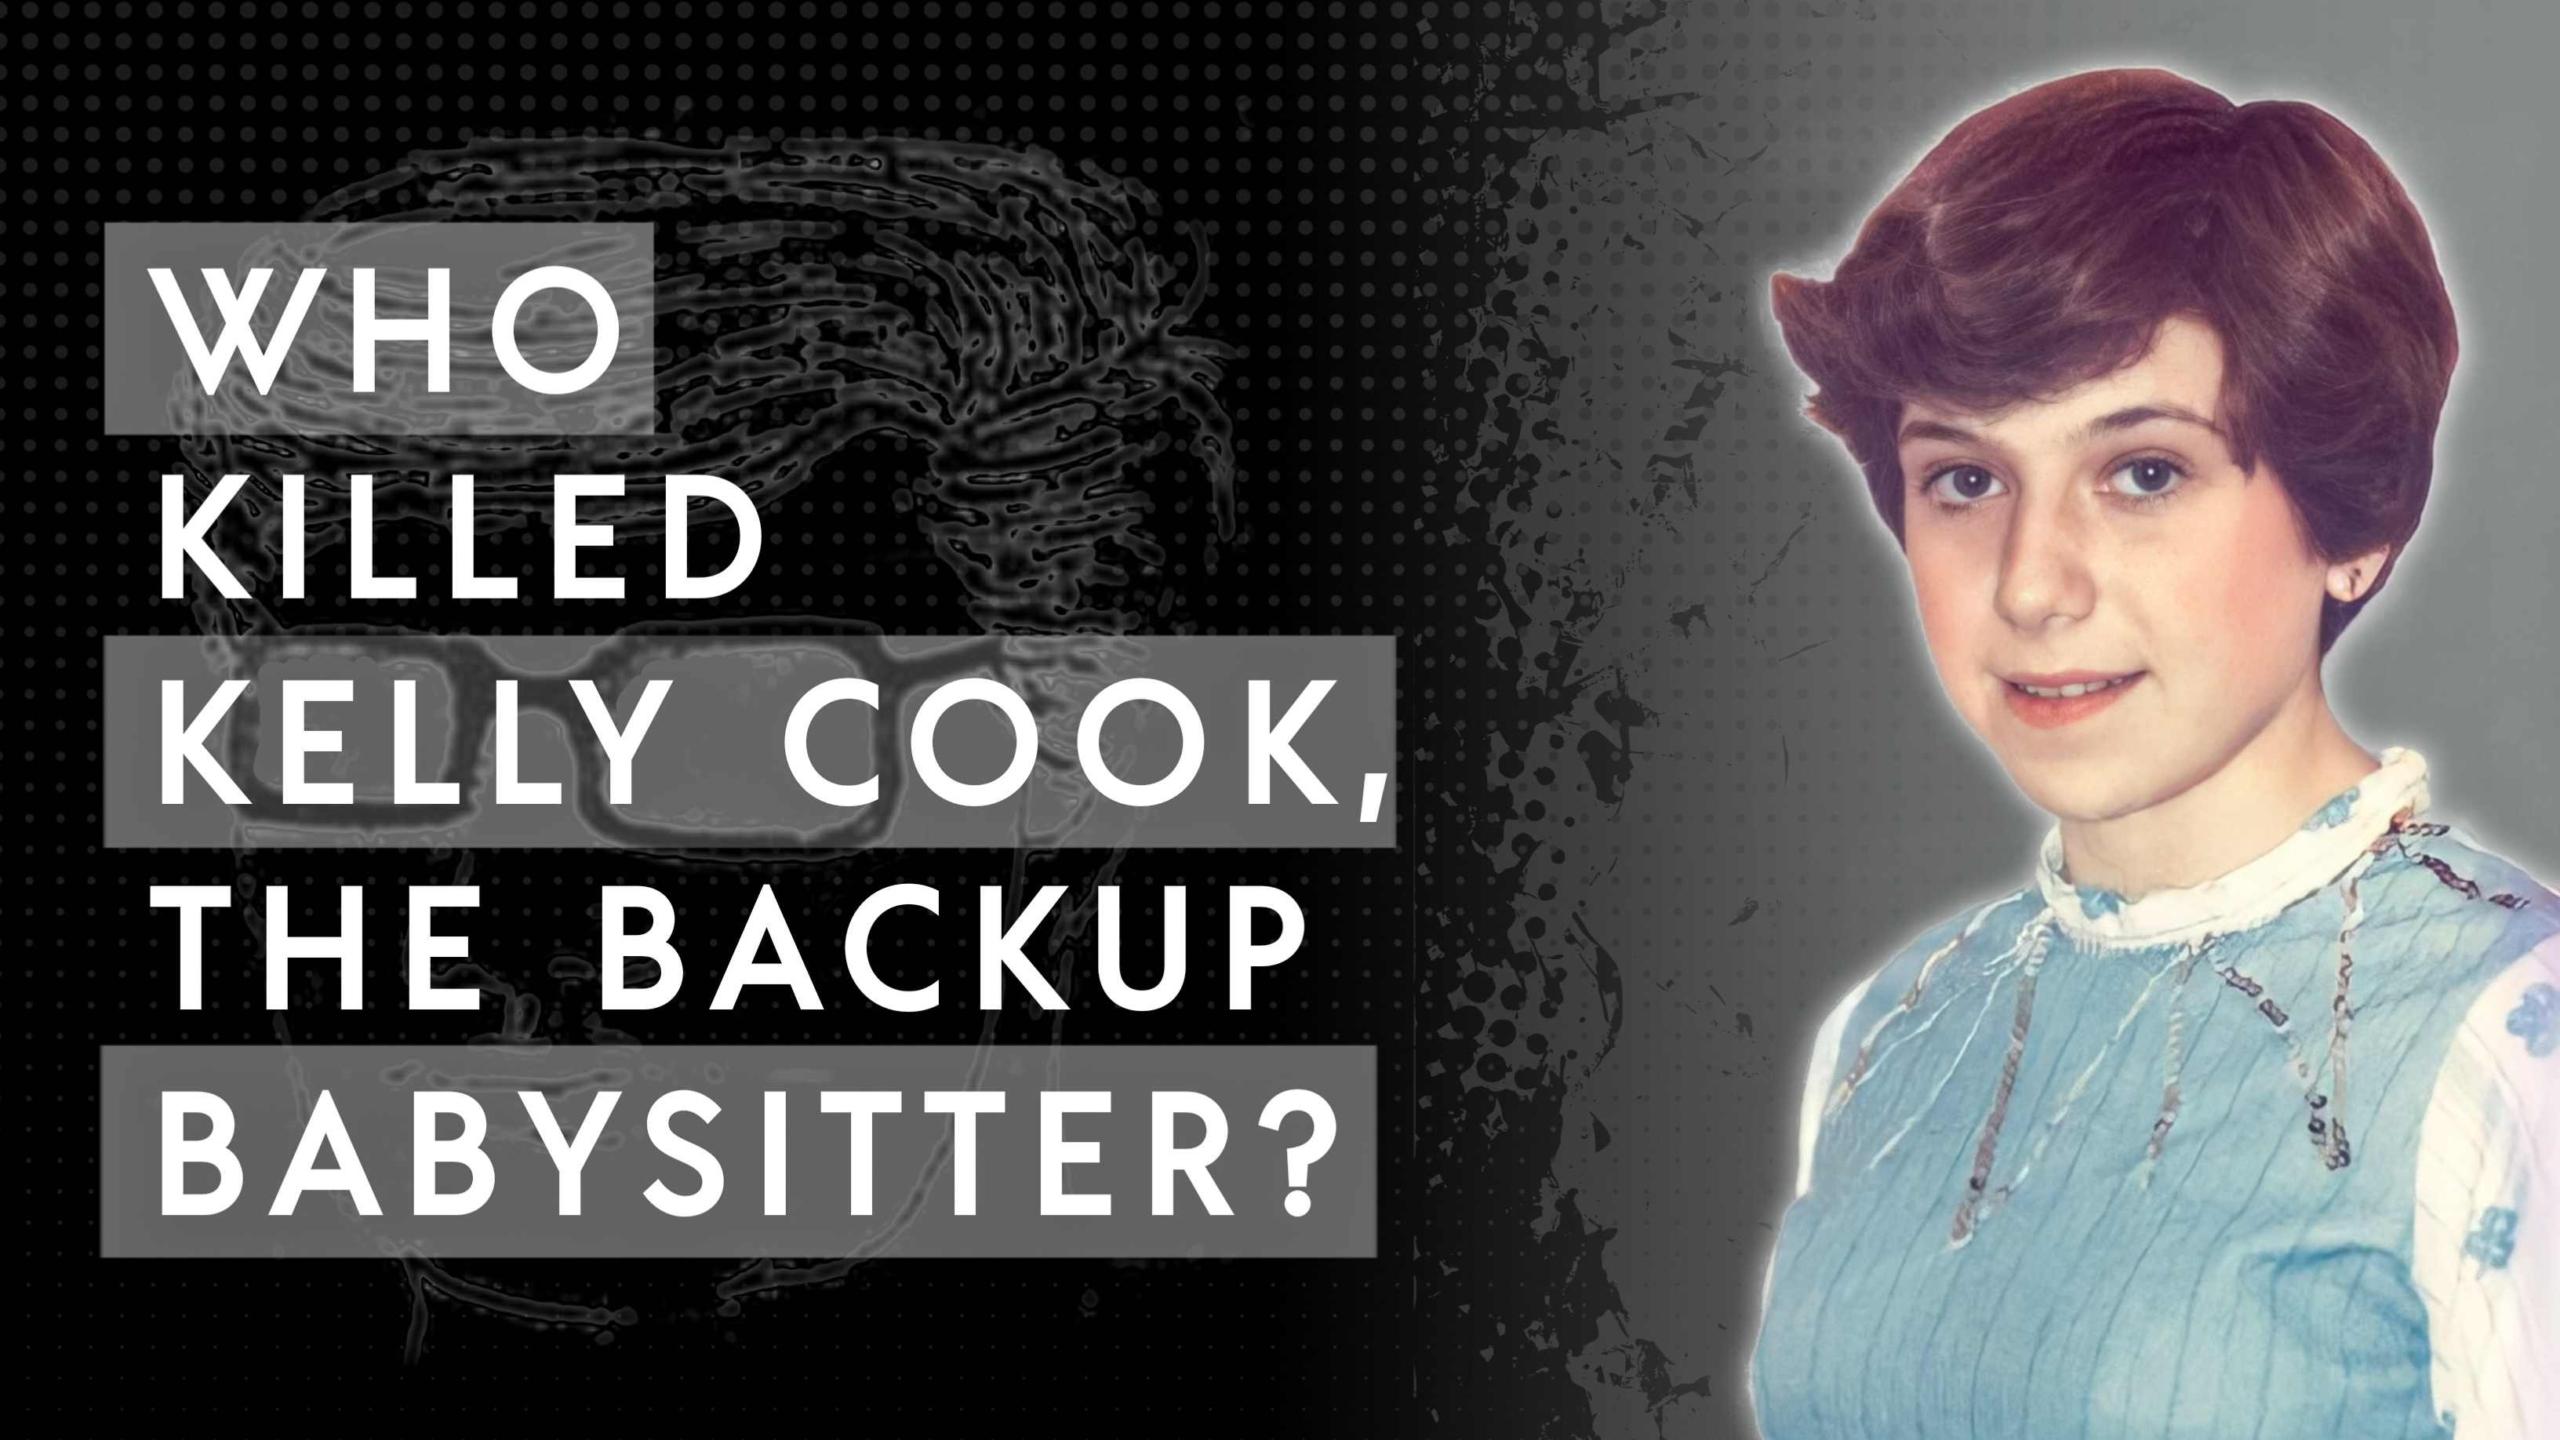 Kelly Cook the backup babysitter